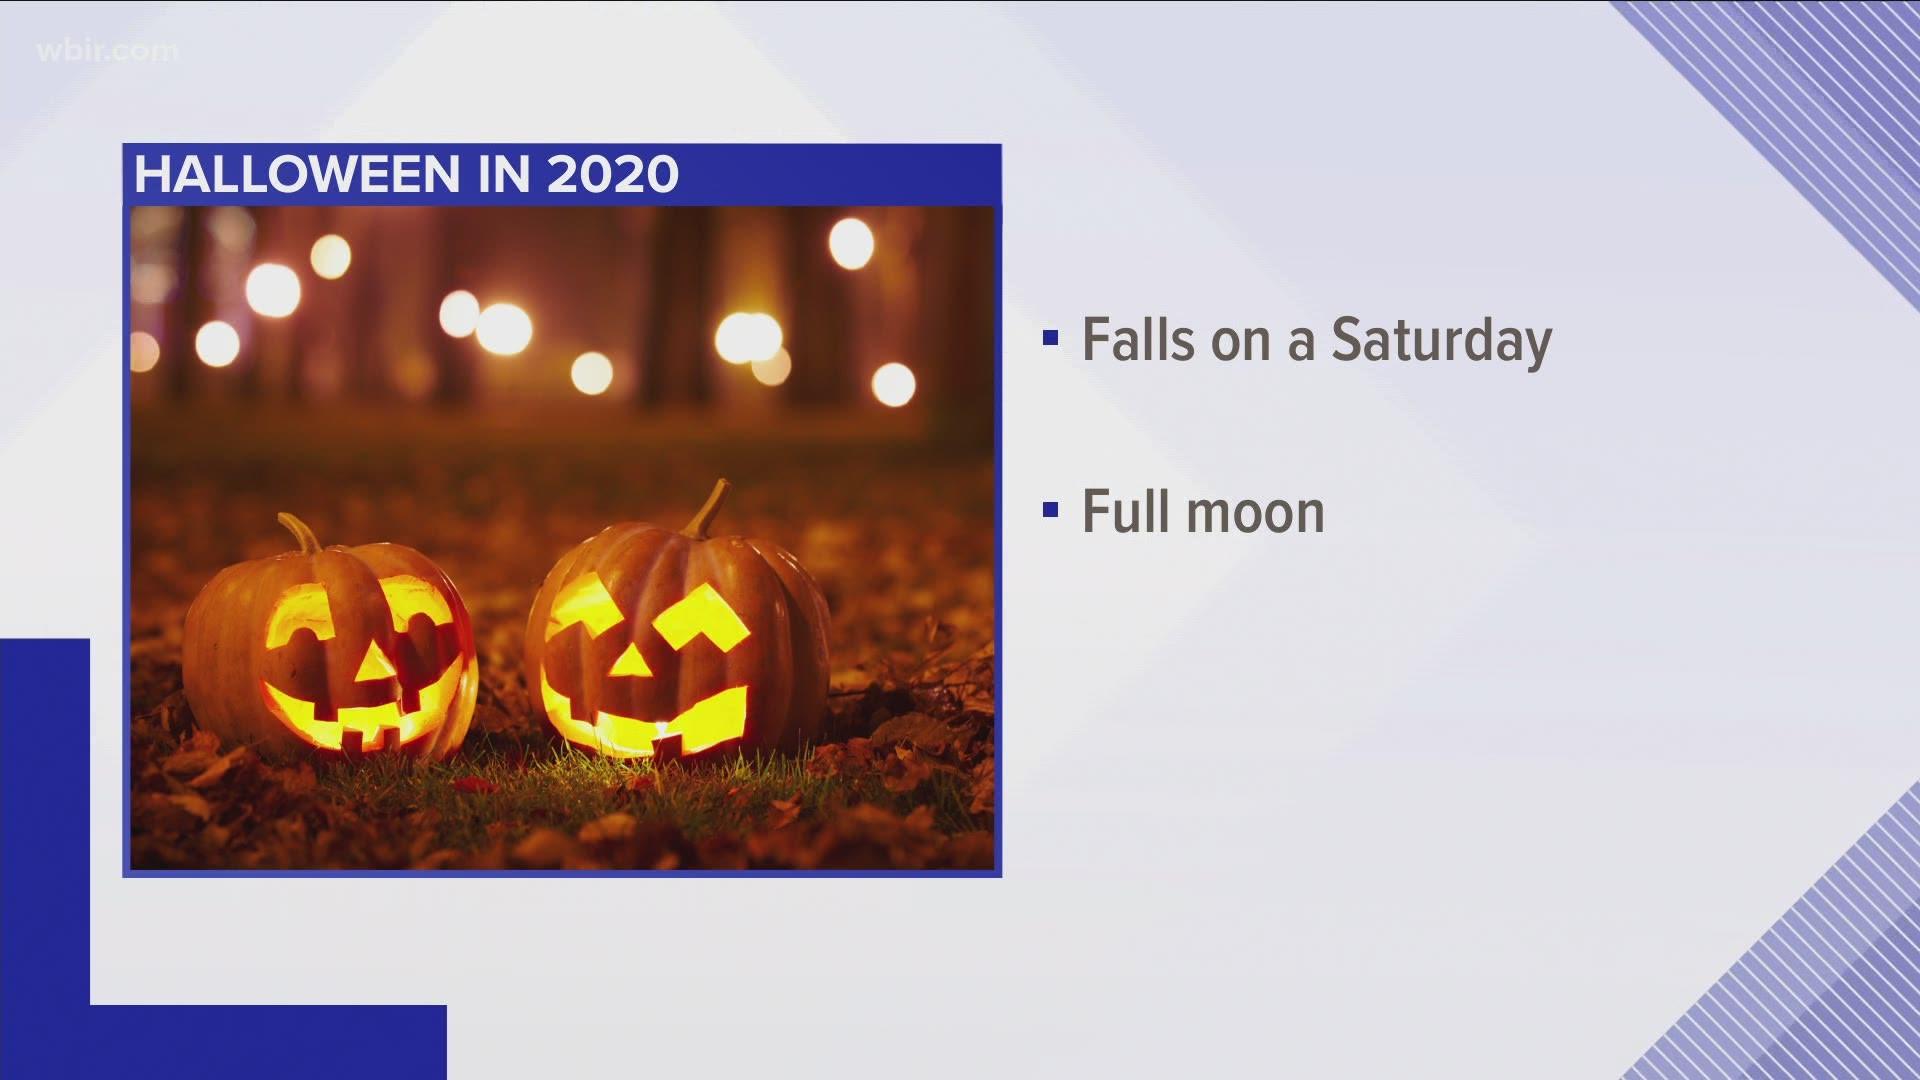 Halloween 2020 Breaking News Knoxville Breaking News, Weather, Traffic, Sports | WBIR.